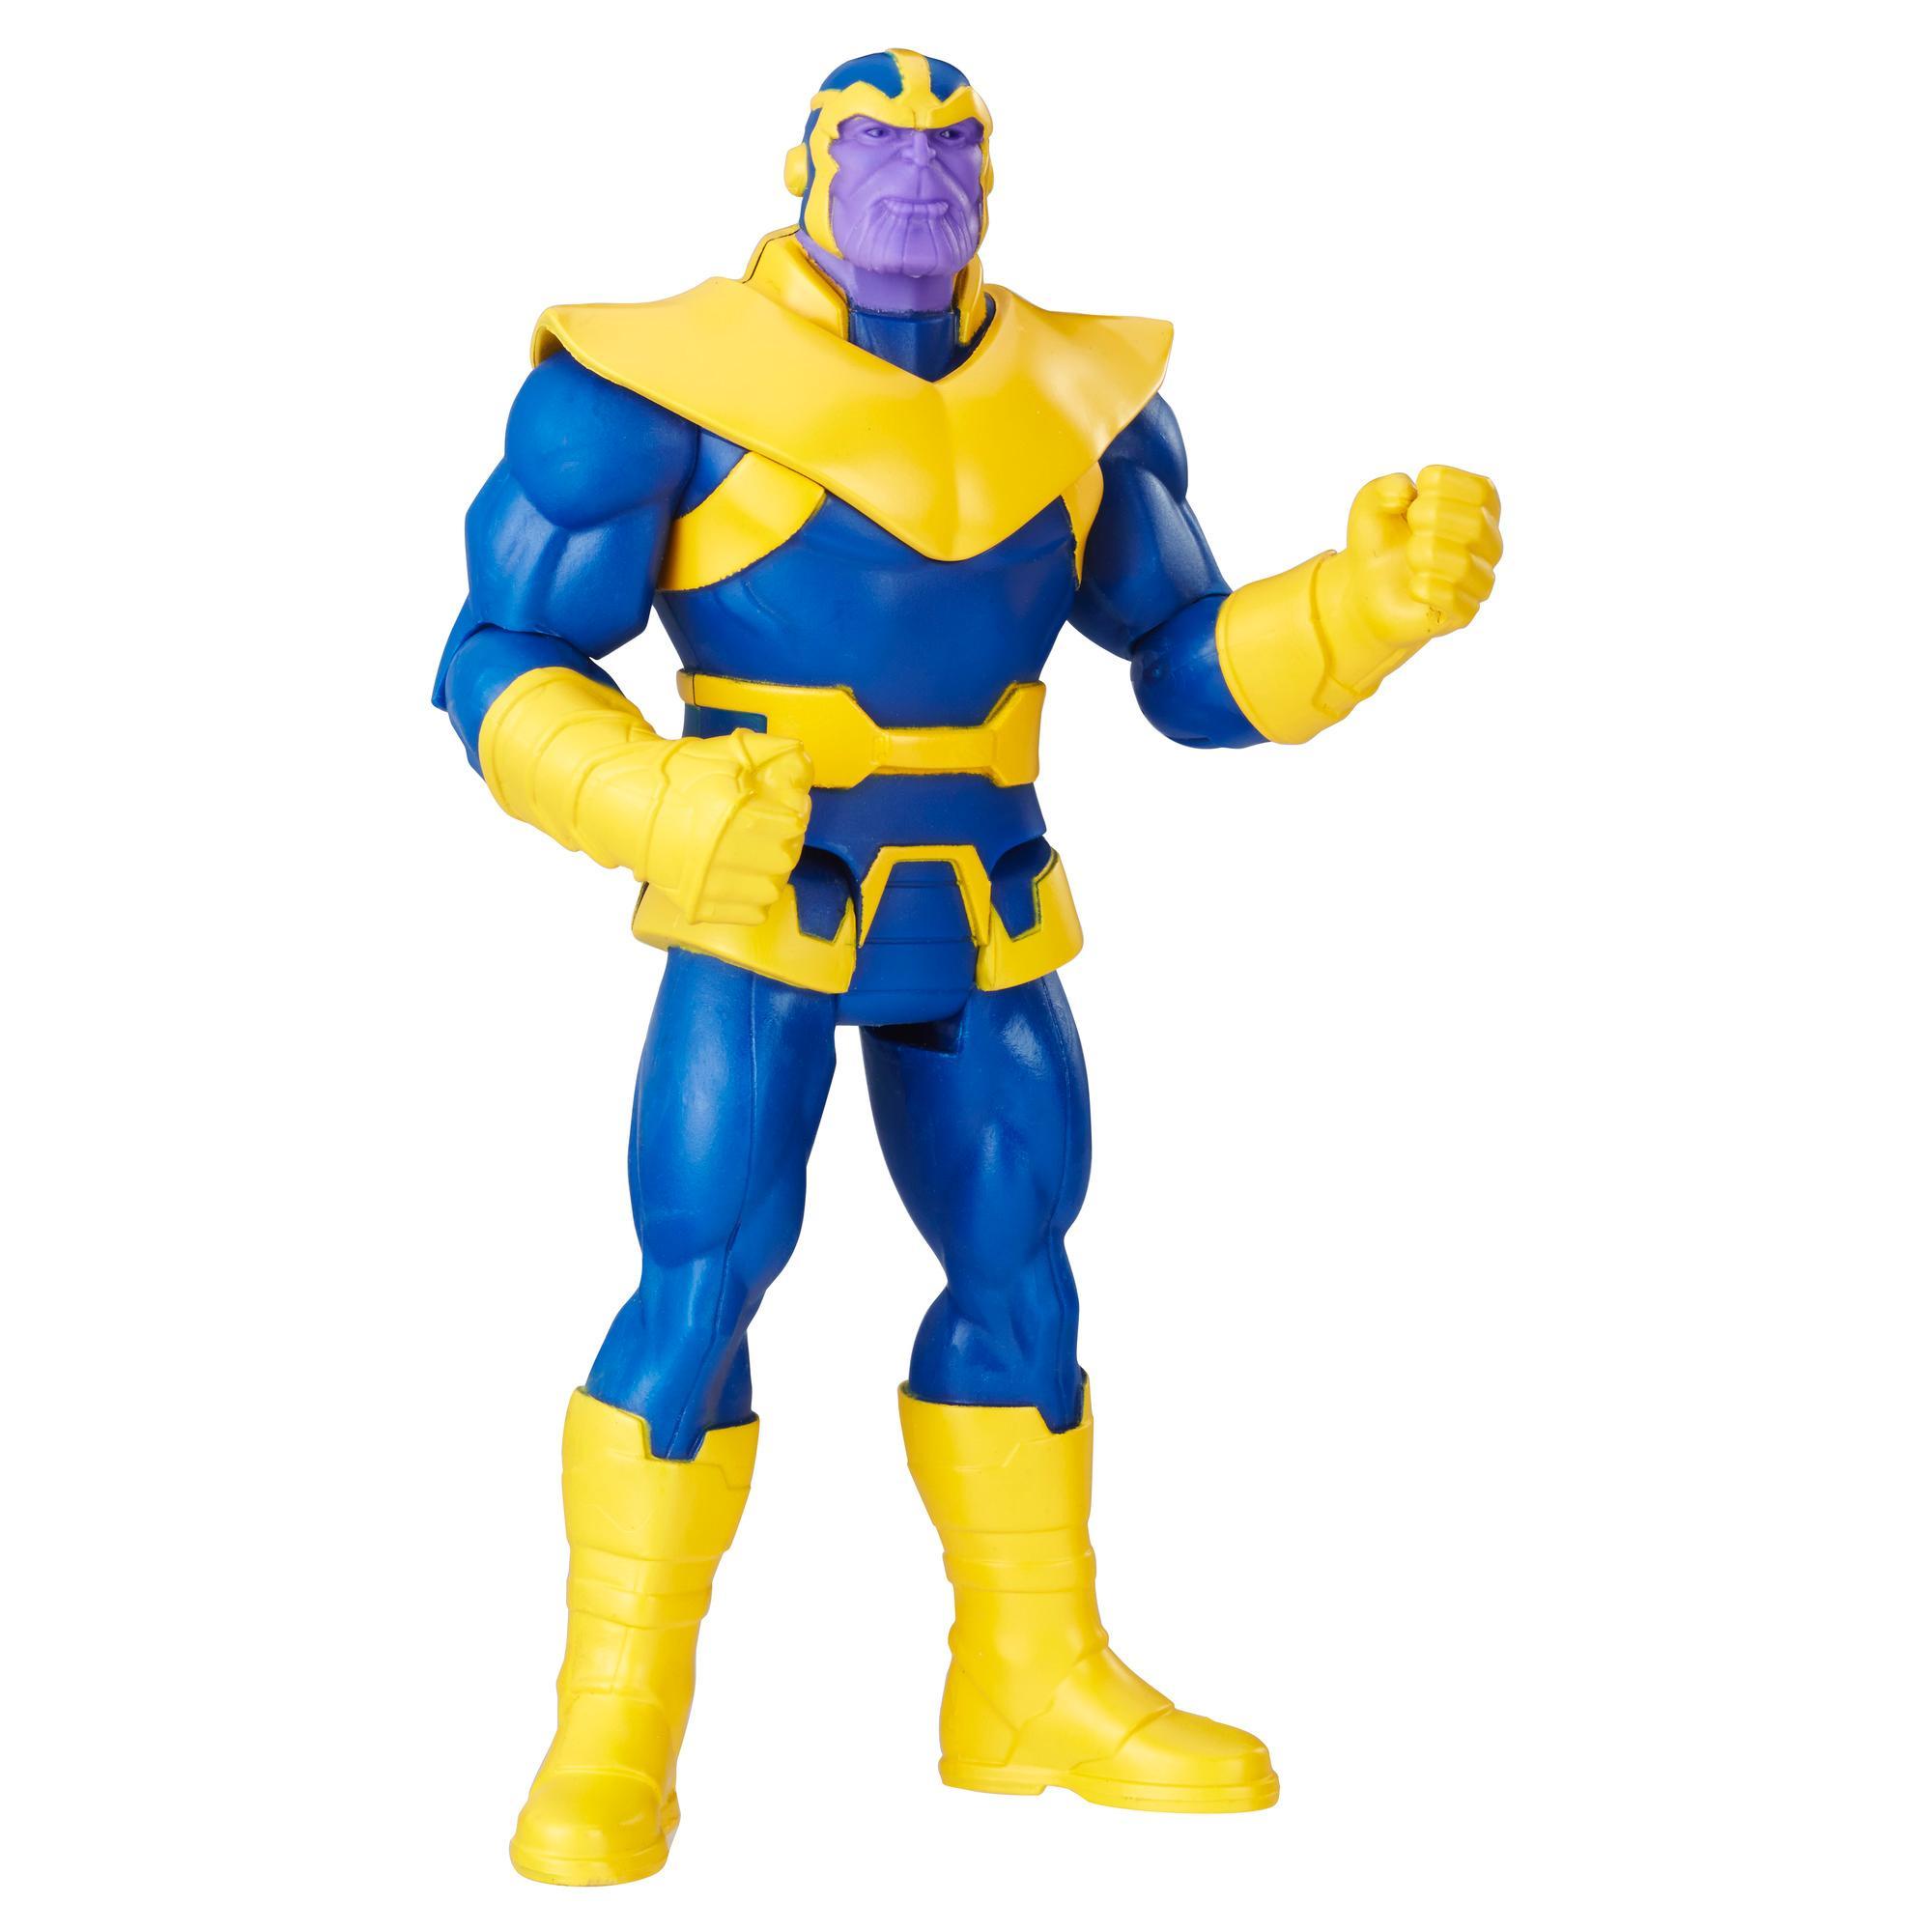 Marvel Guardians of the Galaxy - Thanos de 15 cm (6 in)